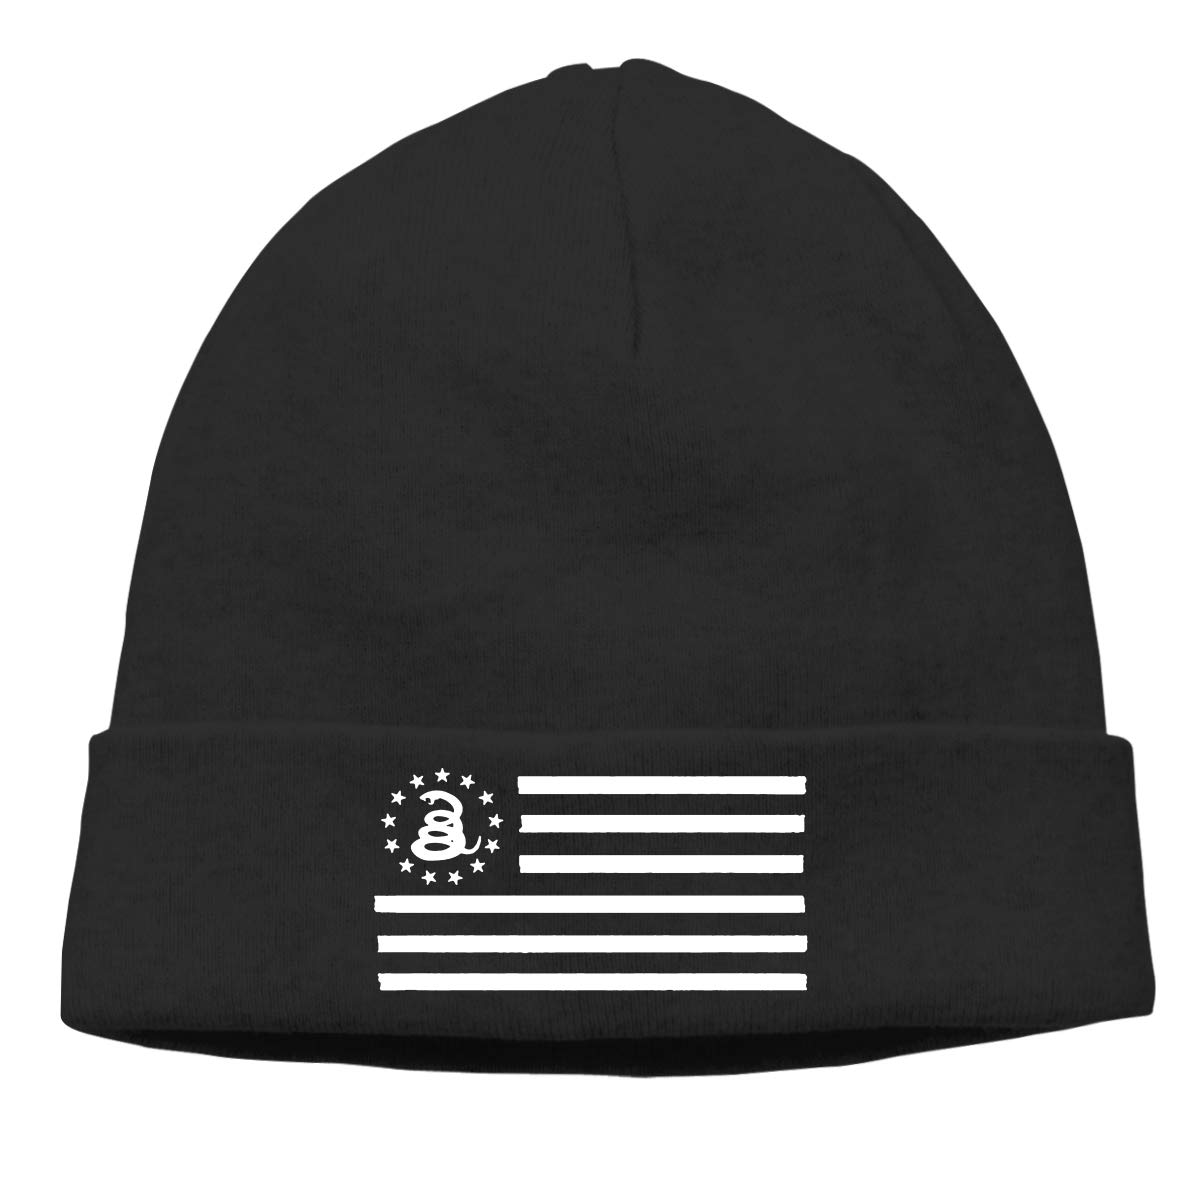 CgyOIUY-lop Beanie Hat Warm Hats Skull Cap Knitted Hat Gadsden Flag